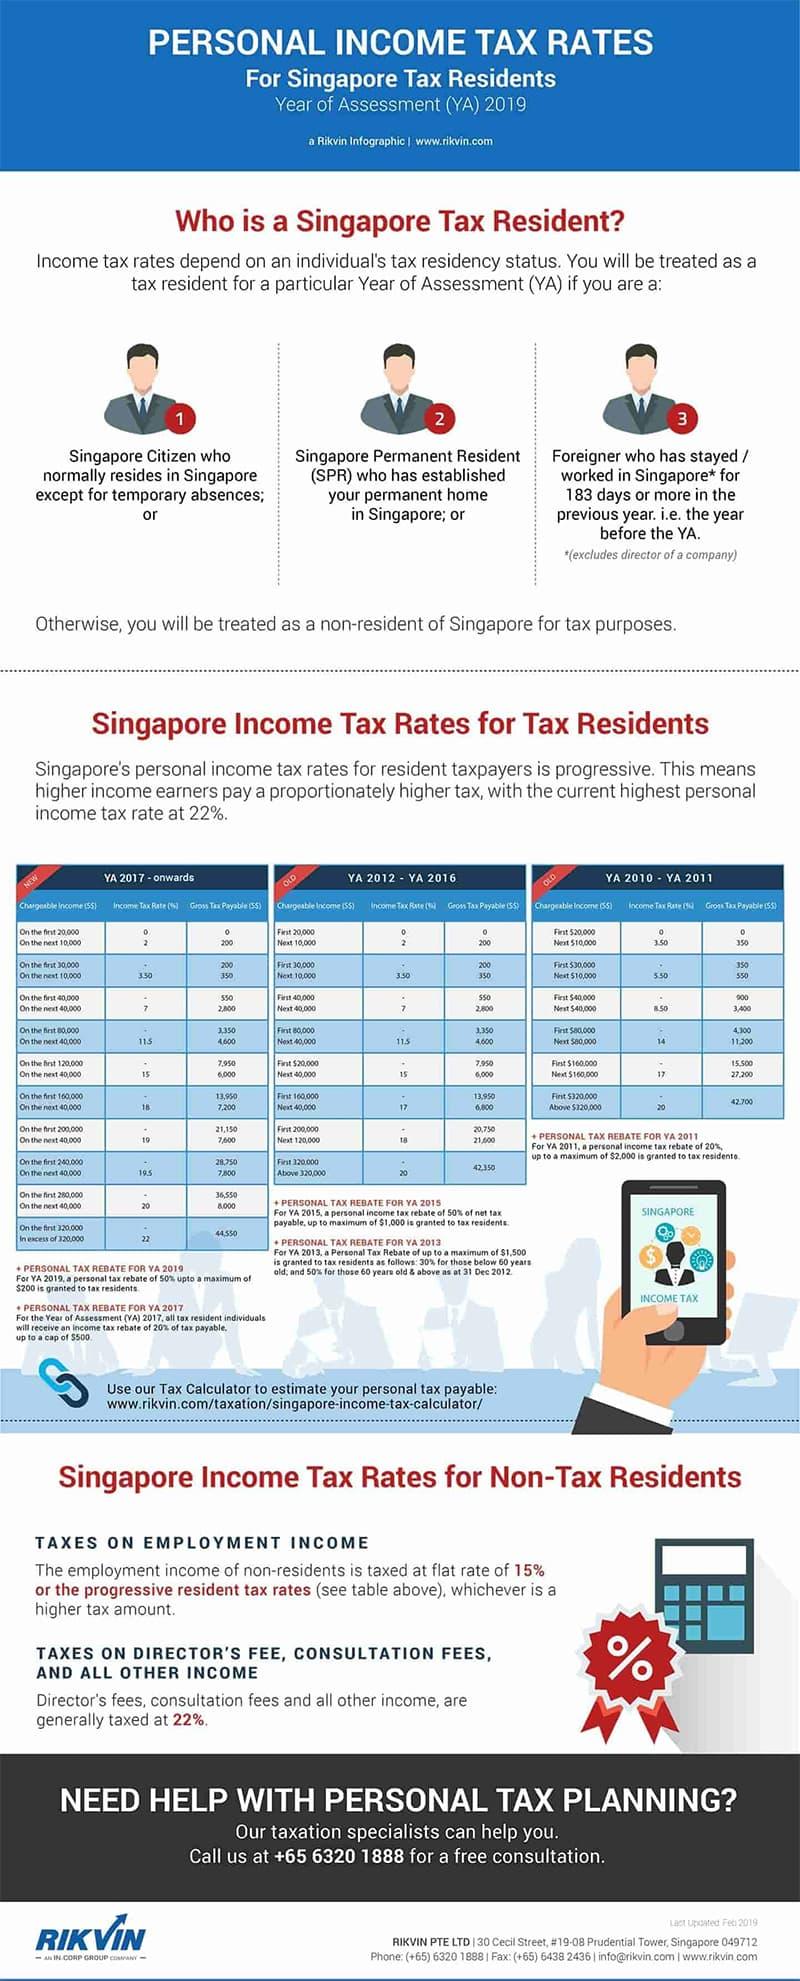 singapore-personal-income-tax-rates-YA-2010-2019-infographic-rikvin Personal Income Tax Rates for Singapore Tax Residents (YA 2010-2019)